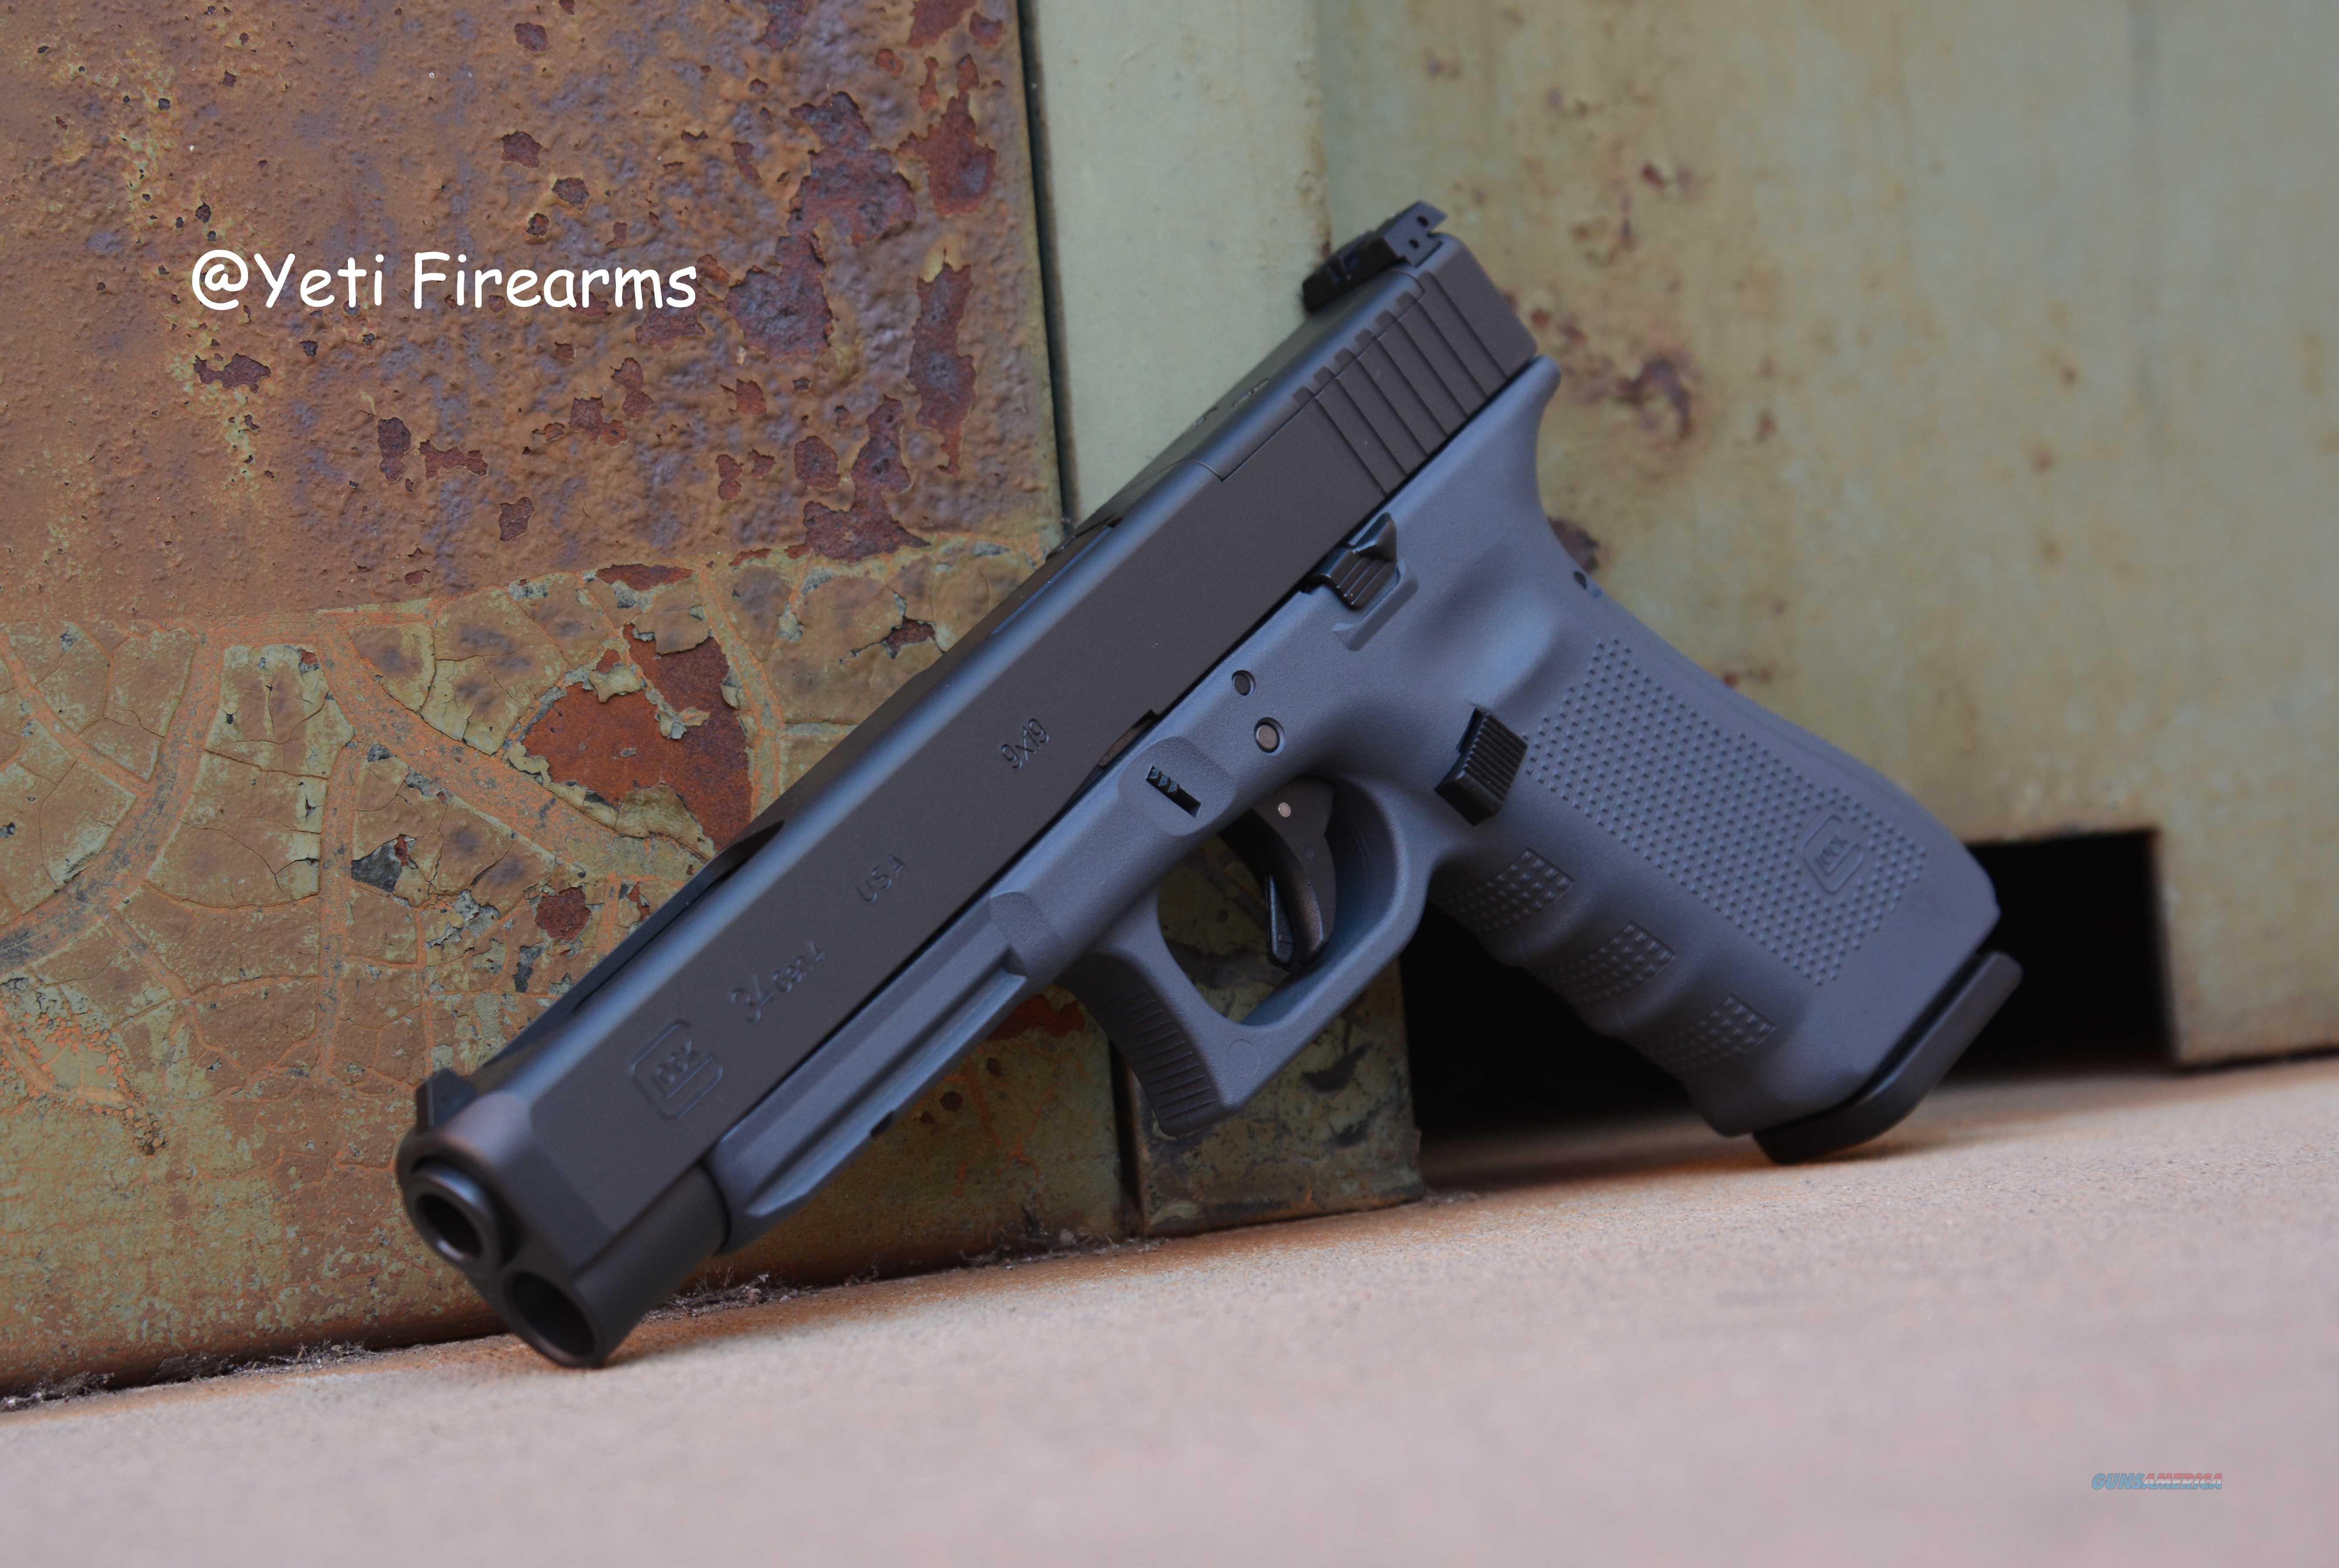 Glock 34 G4 MOS 9mm Glock Gray Cerakote 17rnd  Guns > Pistols > Glock Pistols > 34